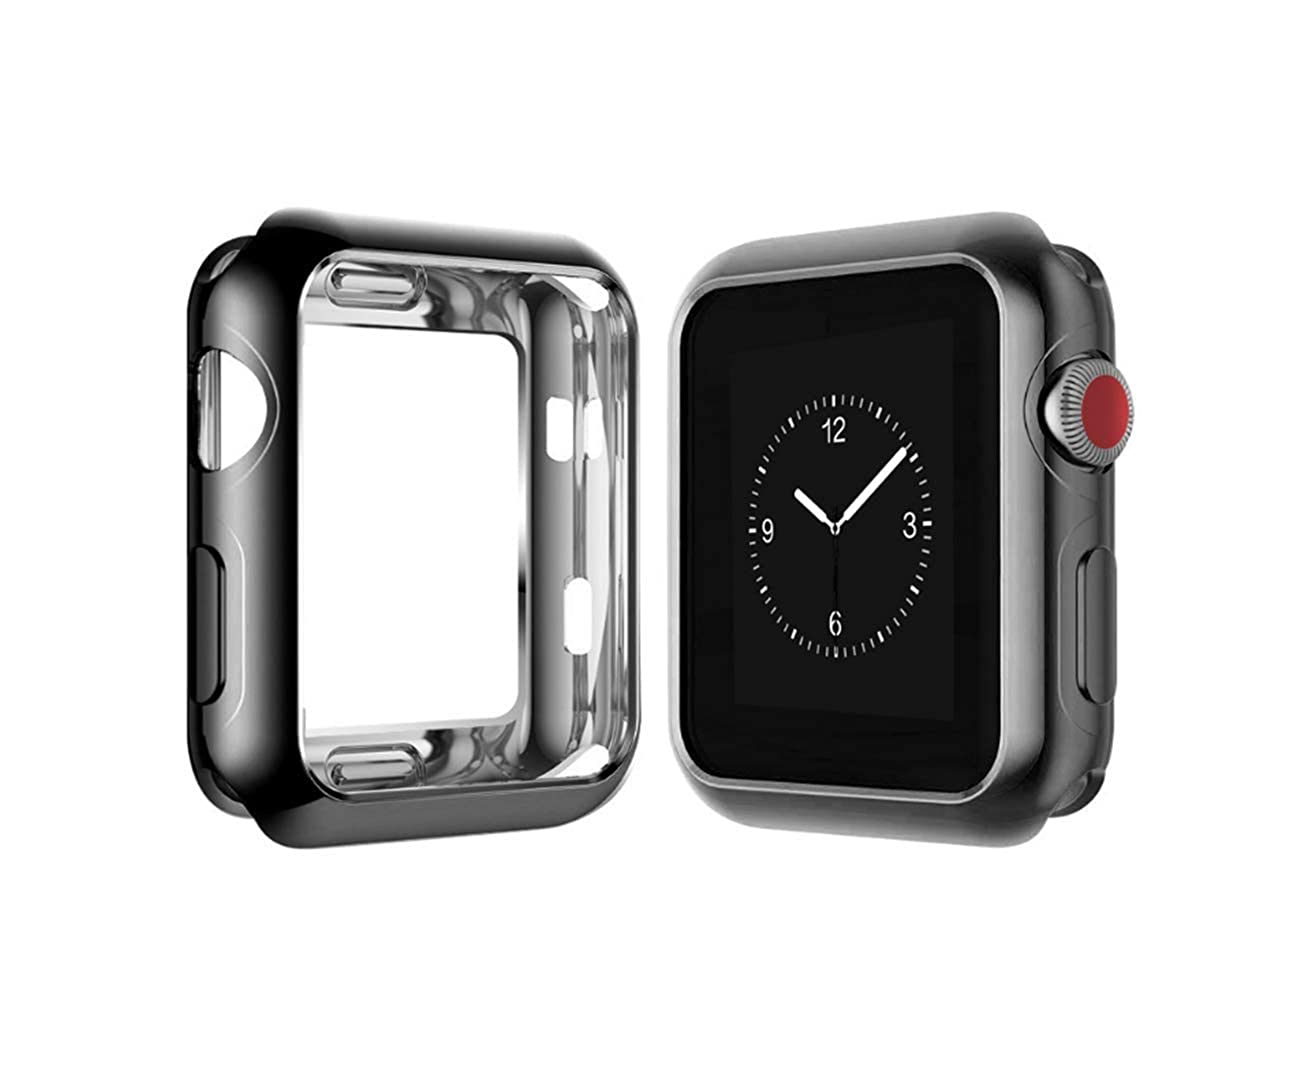 2Buyshop PANTS ボーイズ Apple B07JZ1KNHH ブラック 4 Apple Watch 4 ボーイズ 40mm Apple Watch 4 40mm|ブラック, スマホカバー専門店 ドレスマ:85d25a8b --- krianta.com